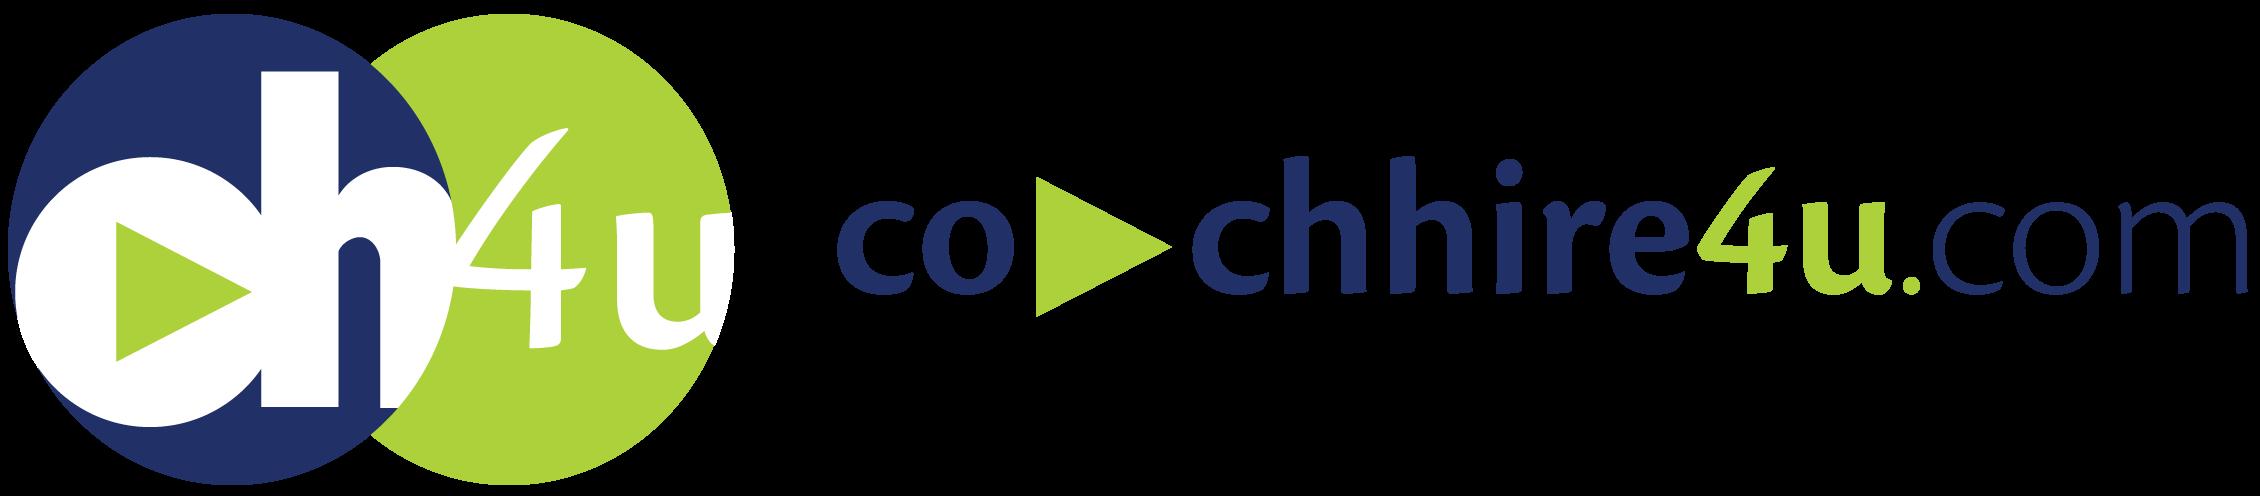 Coachhire4u.com